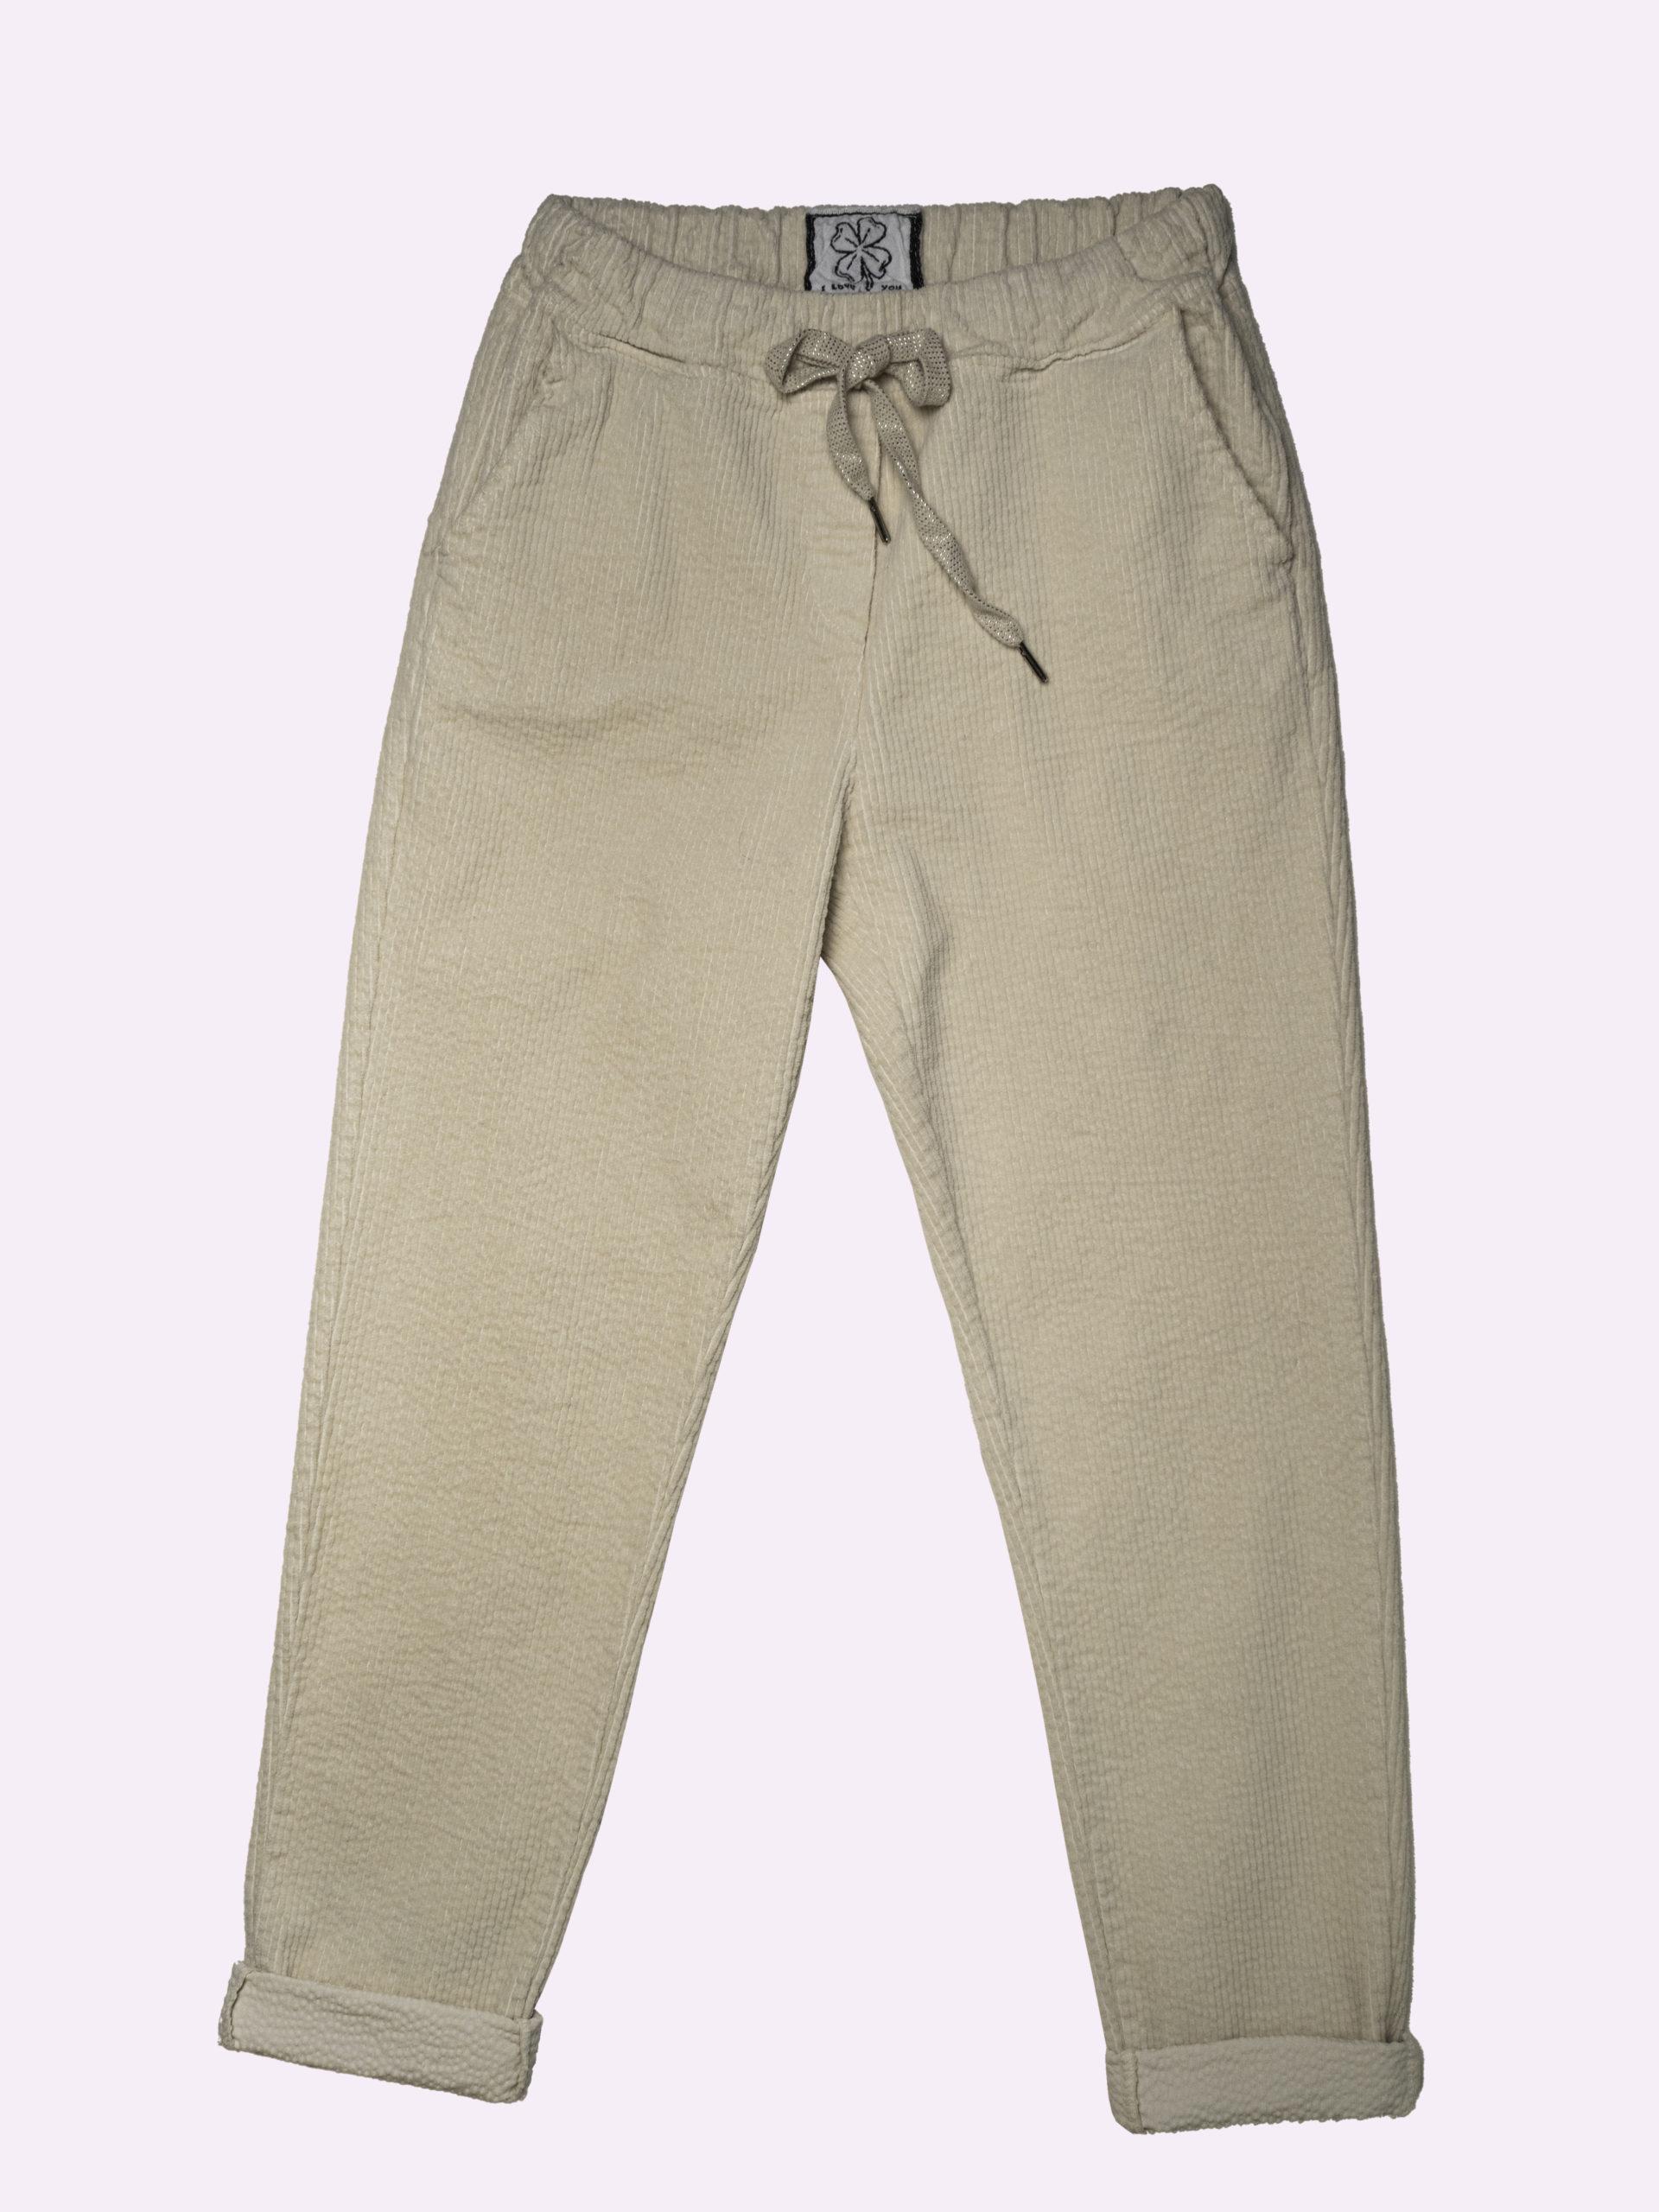 F5618 Pantalone Velluto A Costine